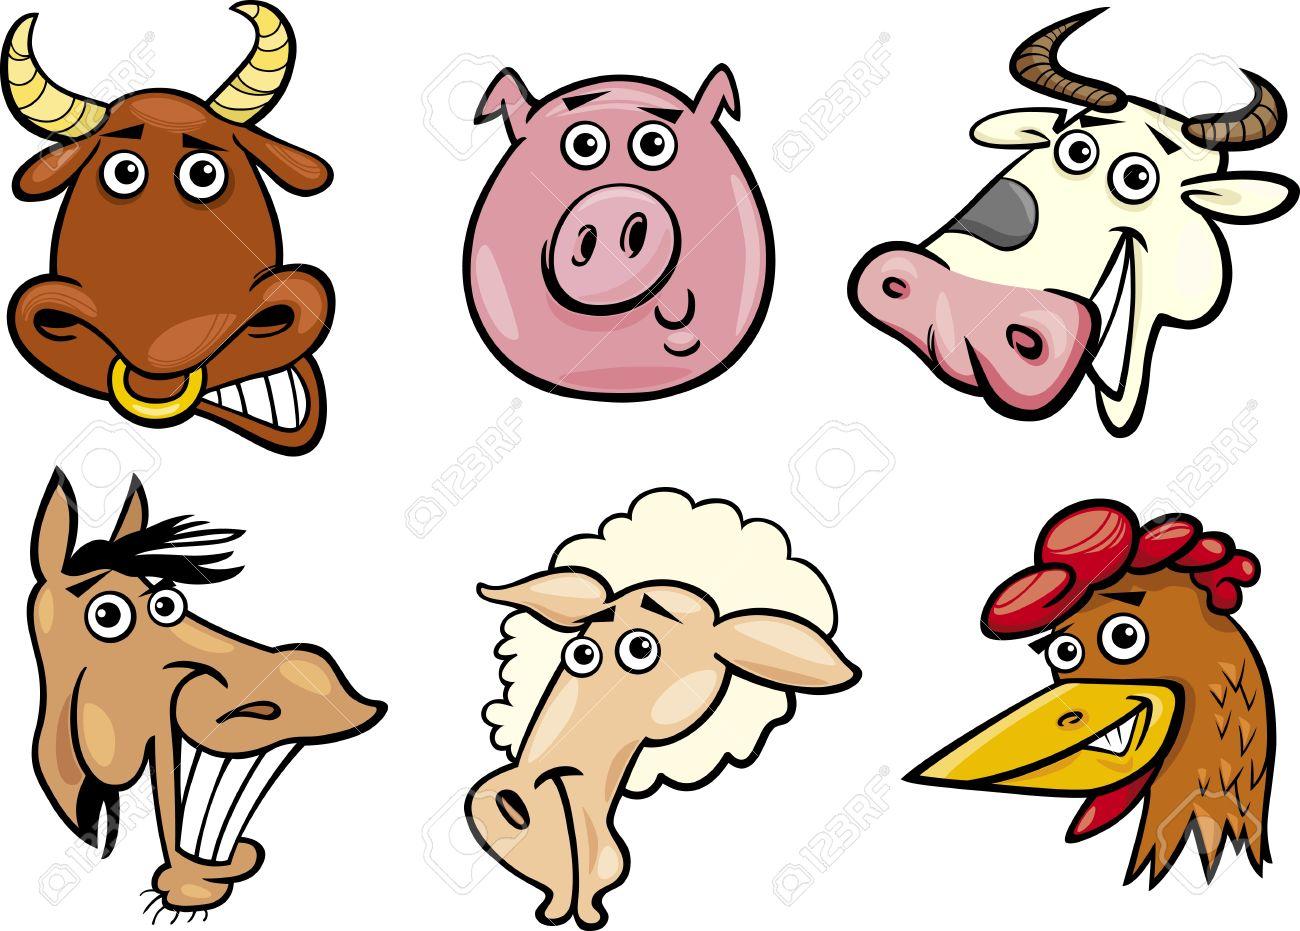 Cartoon farm animals clipart.